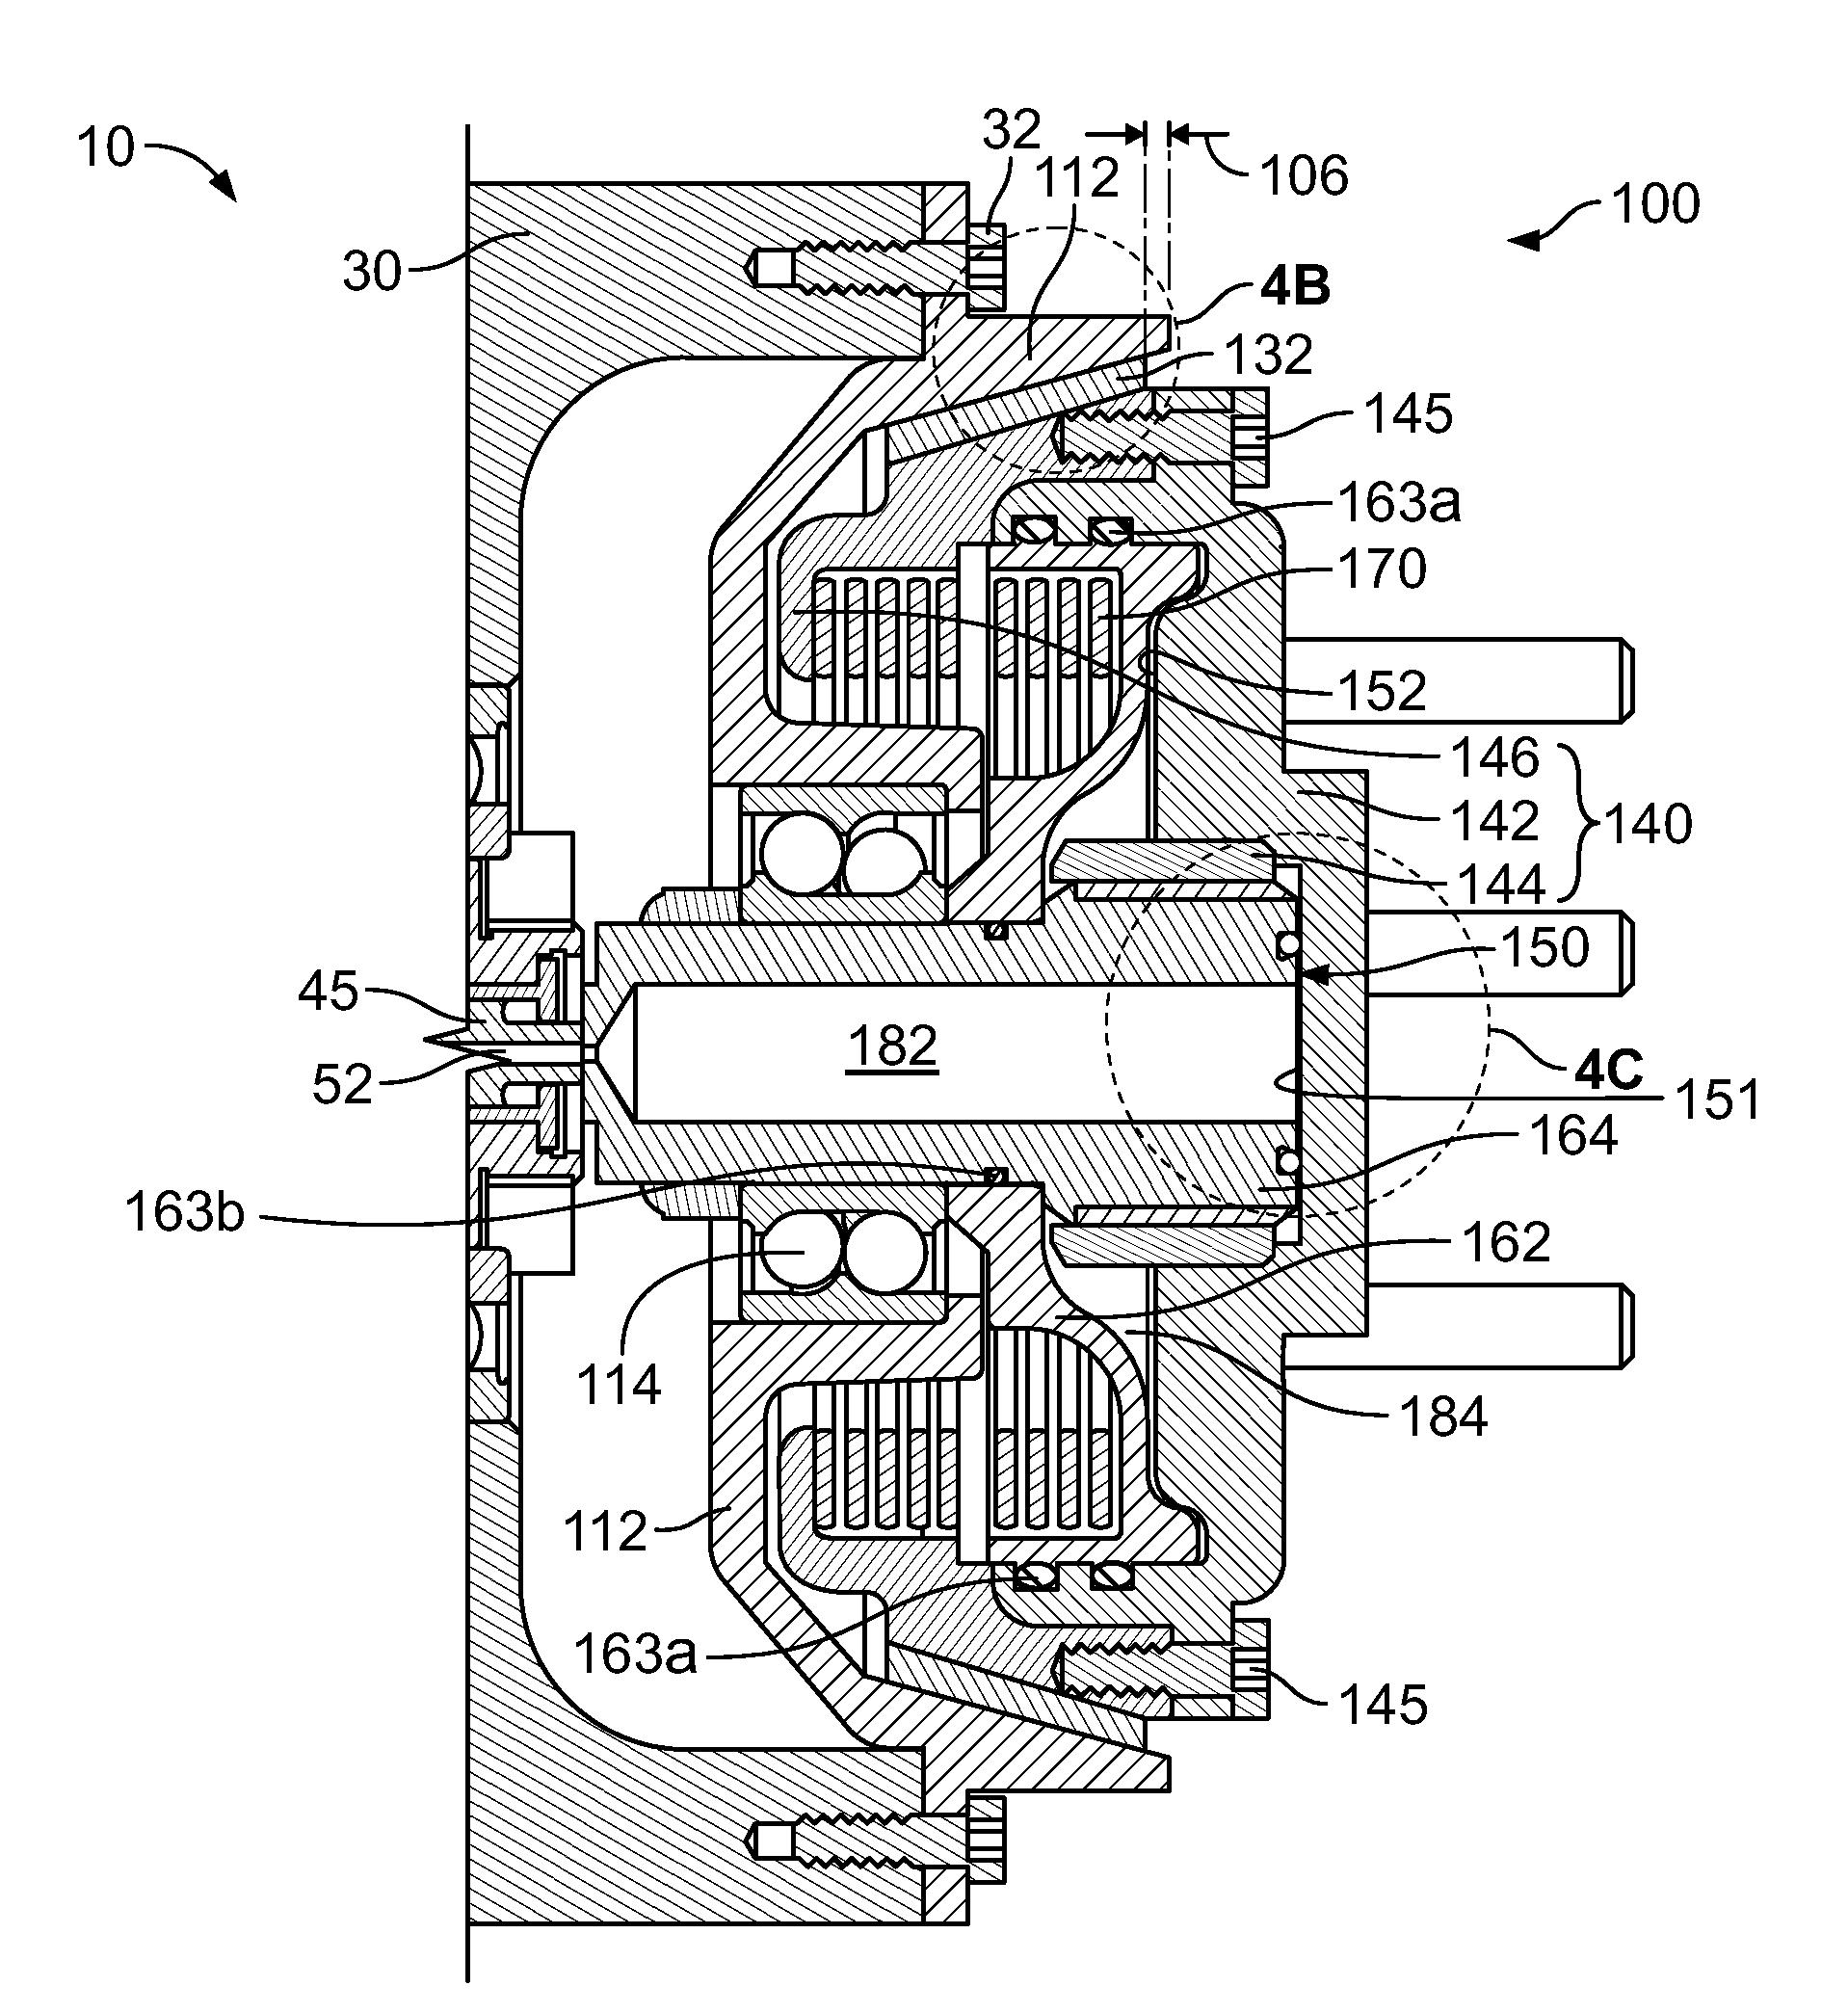 kysor fan clutch wiring diagram horton fan clutch wiring diagram